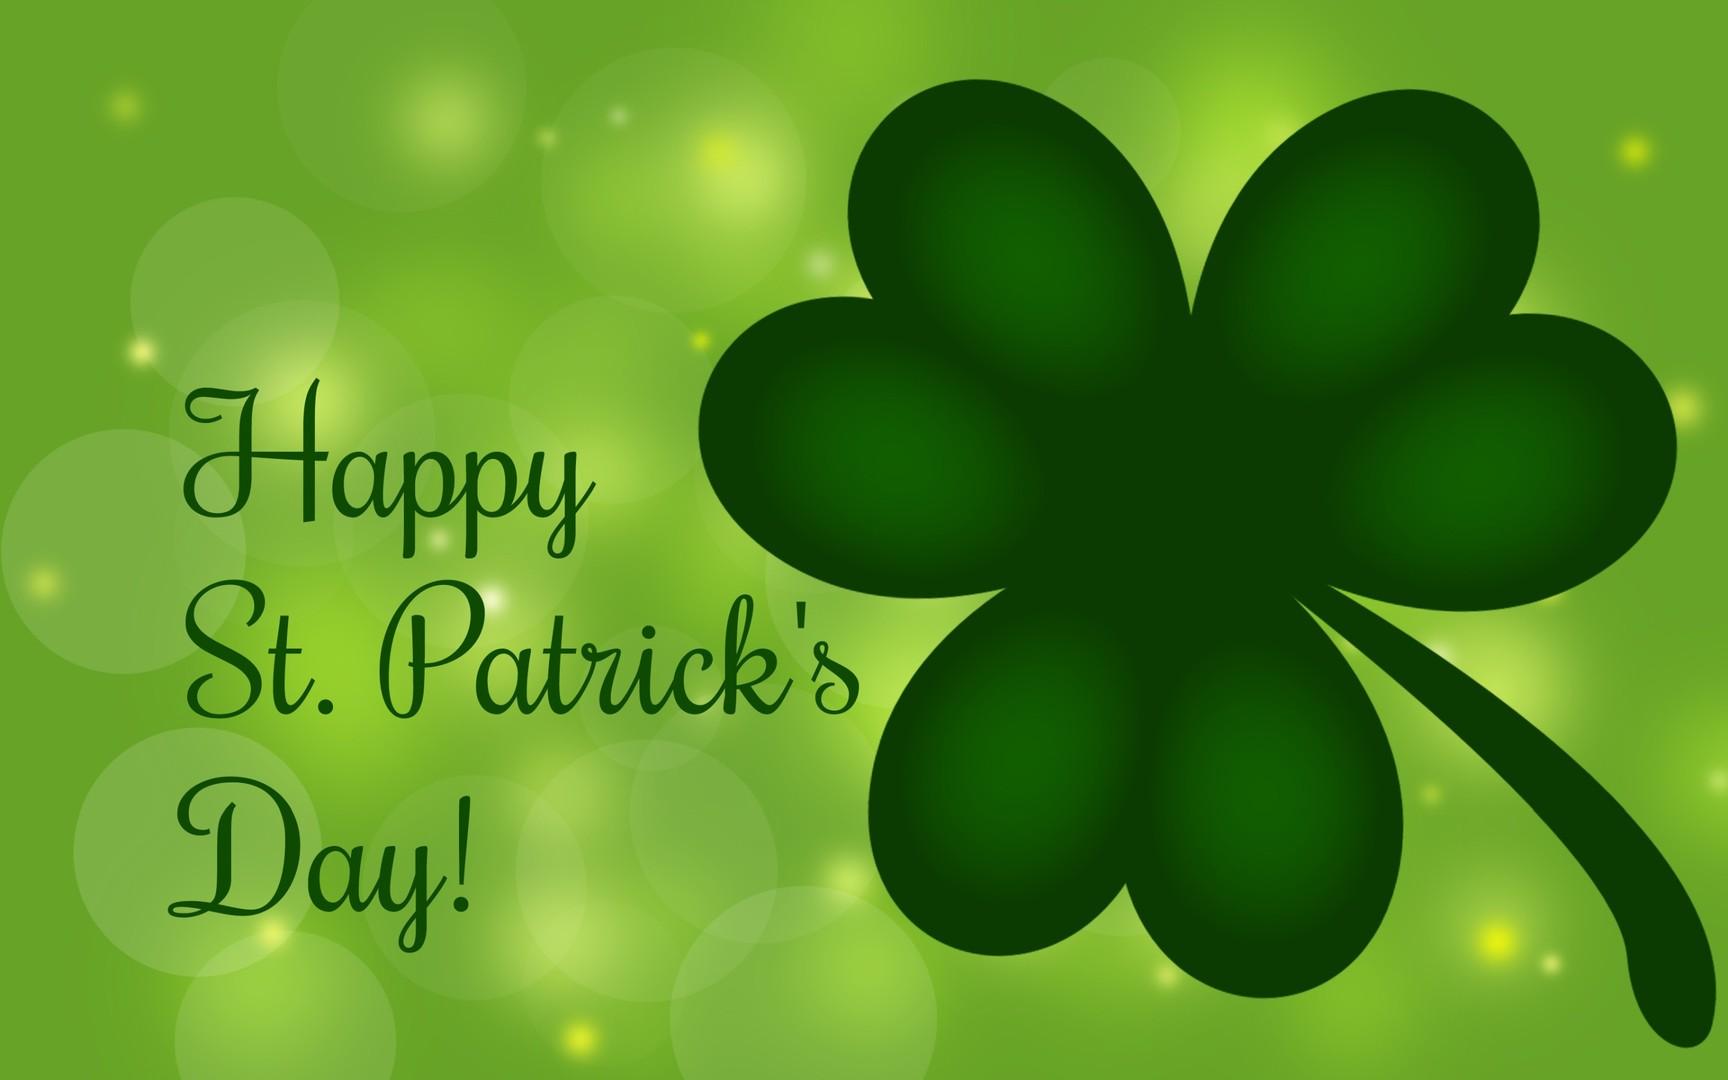 Download Happy Saint Patrick's Day! wallpaper